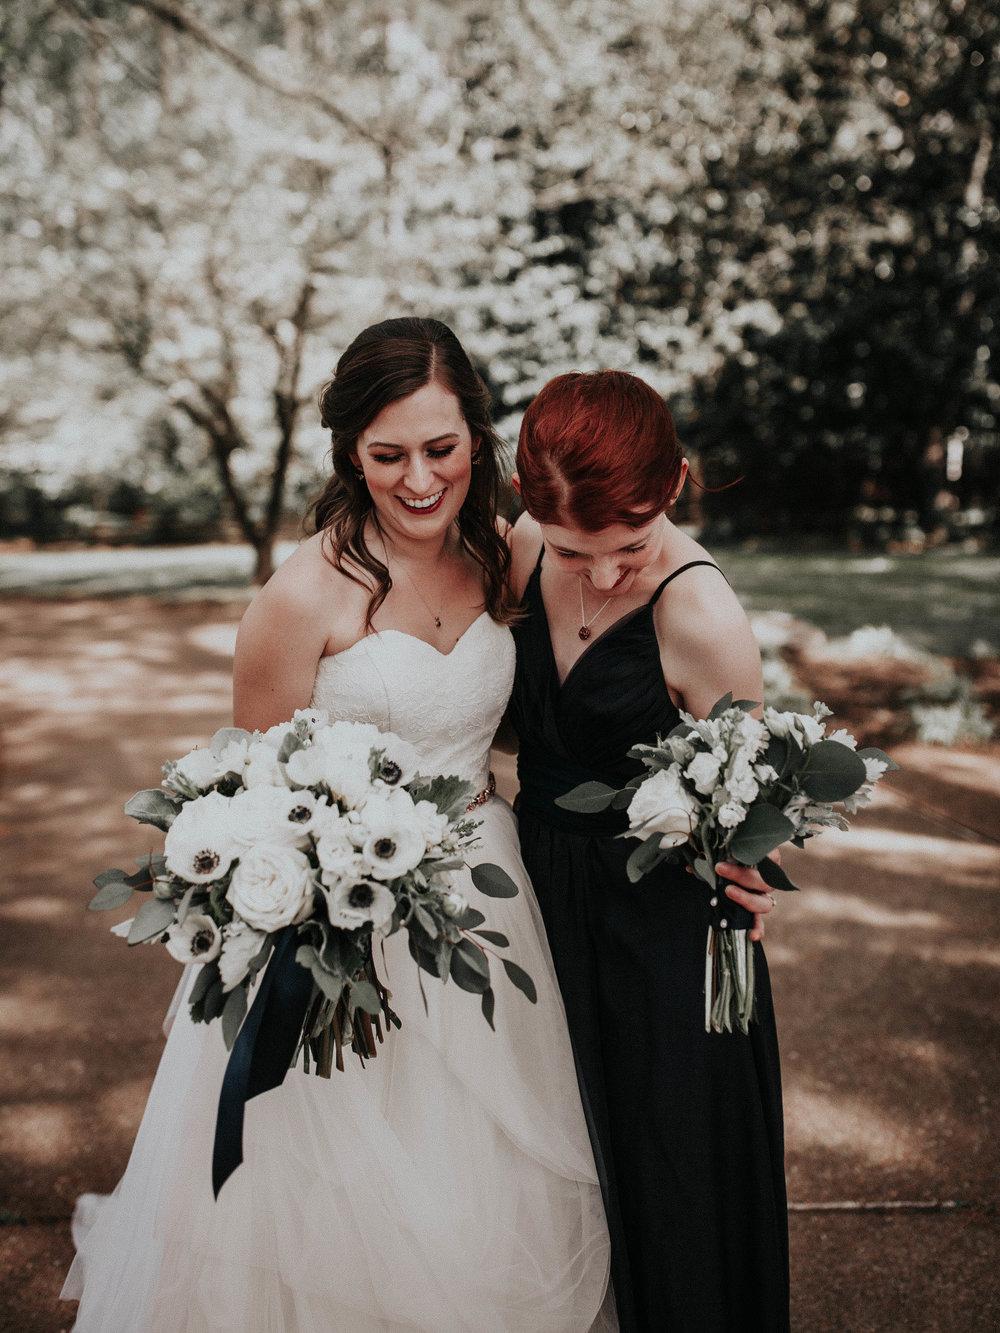 Adam_and_Hannah_Wedding_CharisLauren__5030.jpg